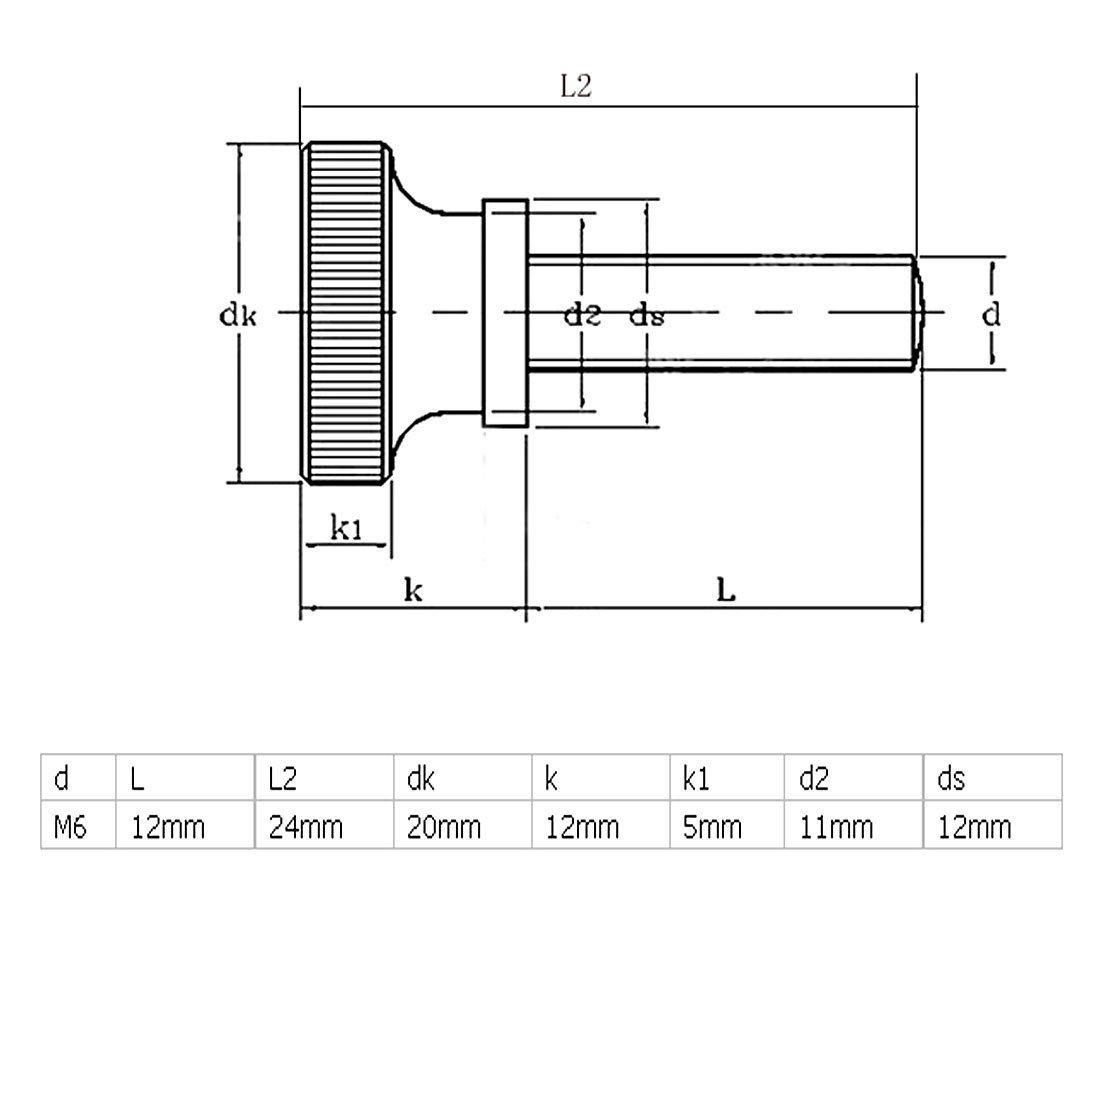 eDealMax a16050300ux0545 M6x12mm galvanizado métrica plana estriada cabeza tornillos de ajuste manual de la máquina Tornillos - - Amazon.com